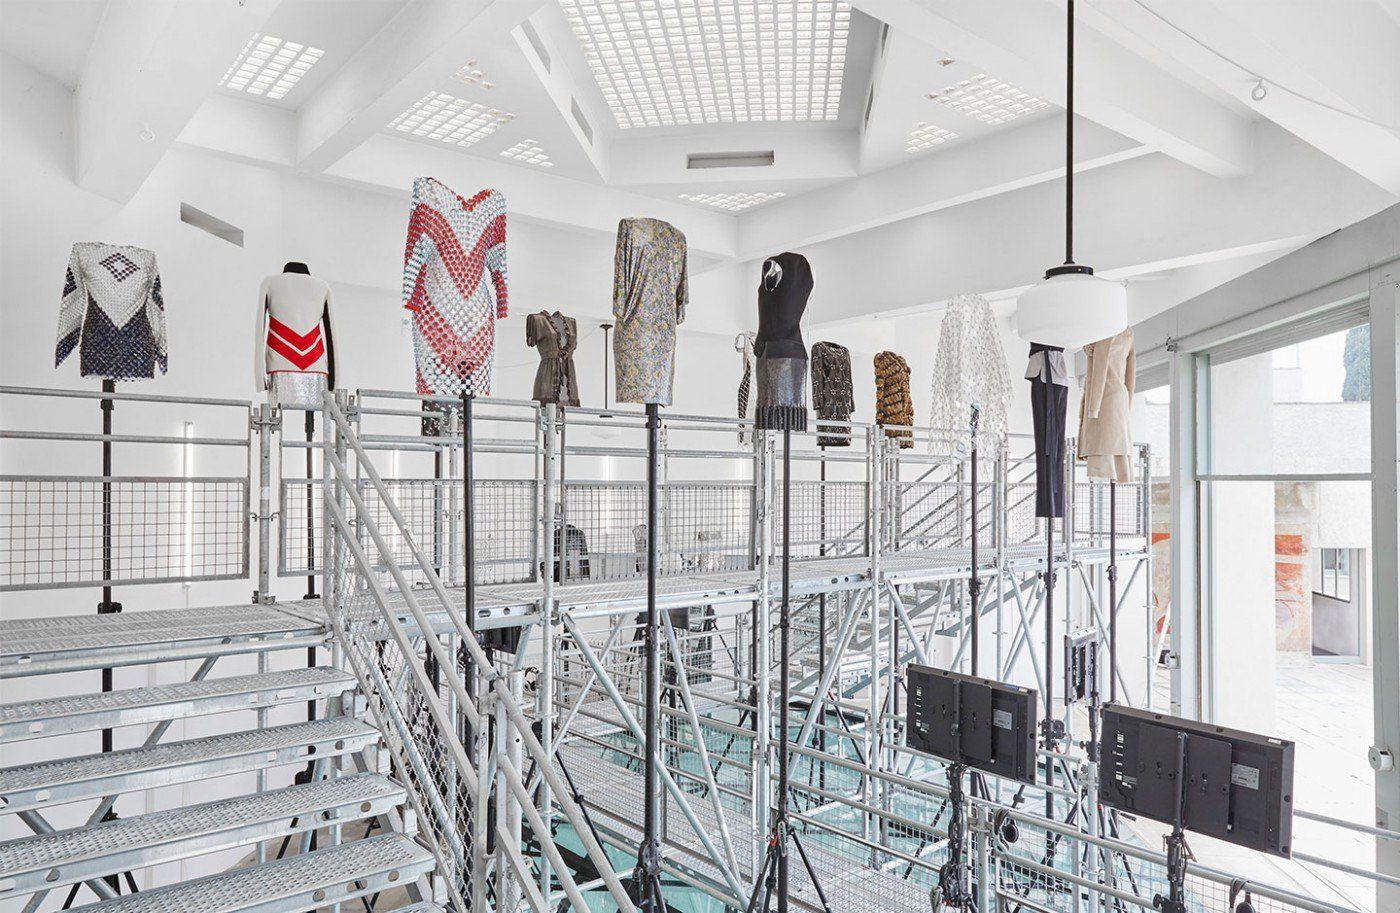 Work in Progress,Paco Rabanne exhibition - MUSE